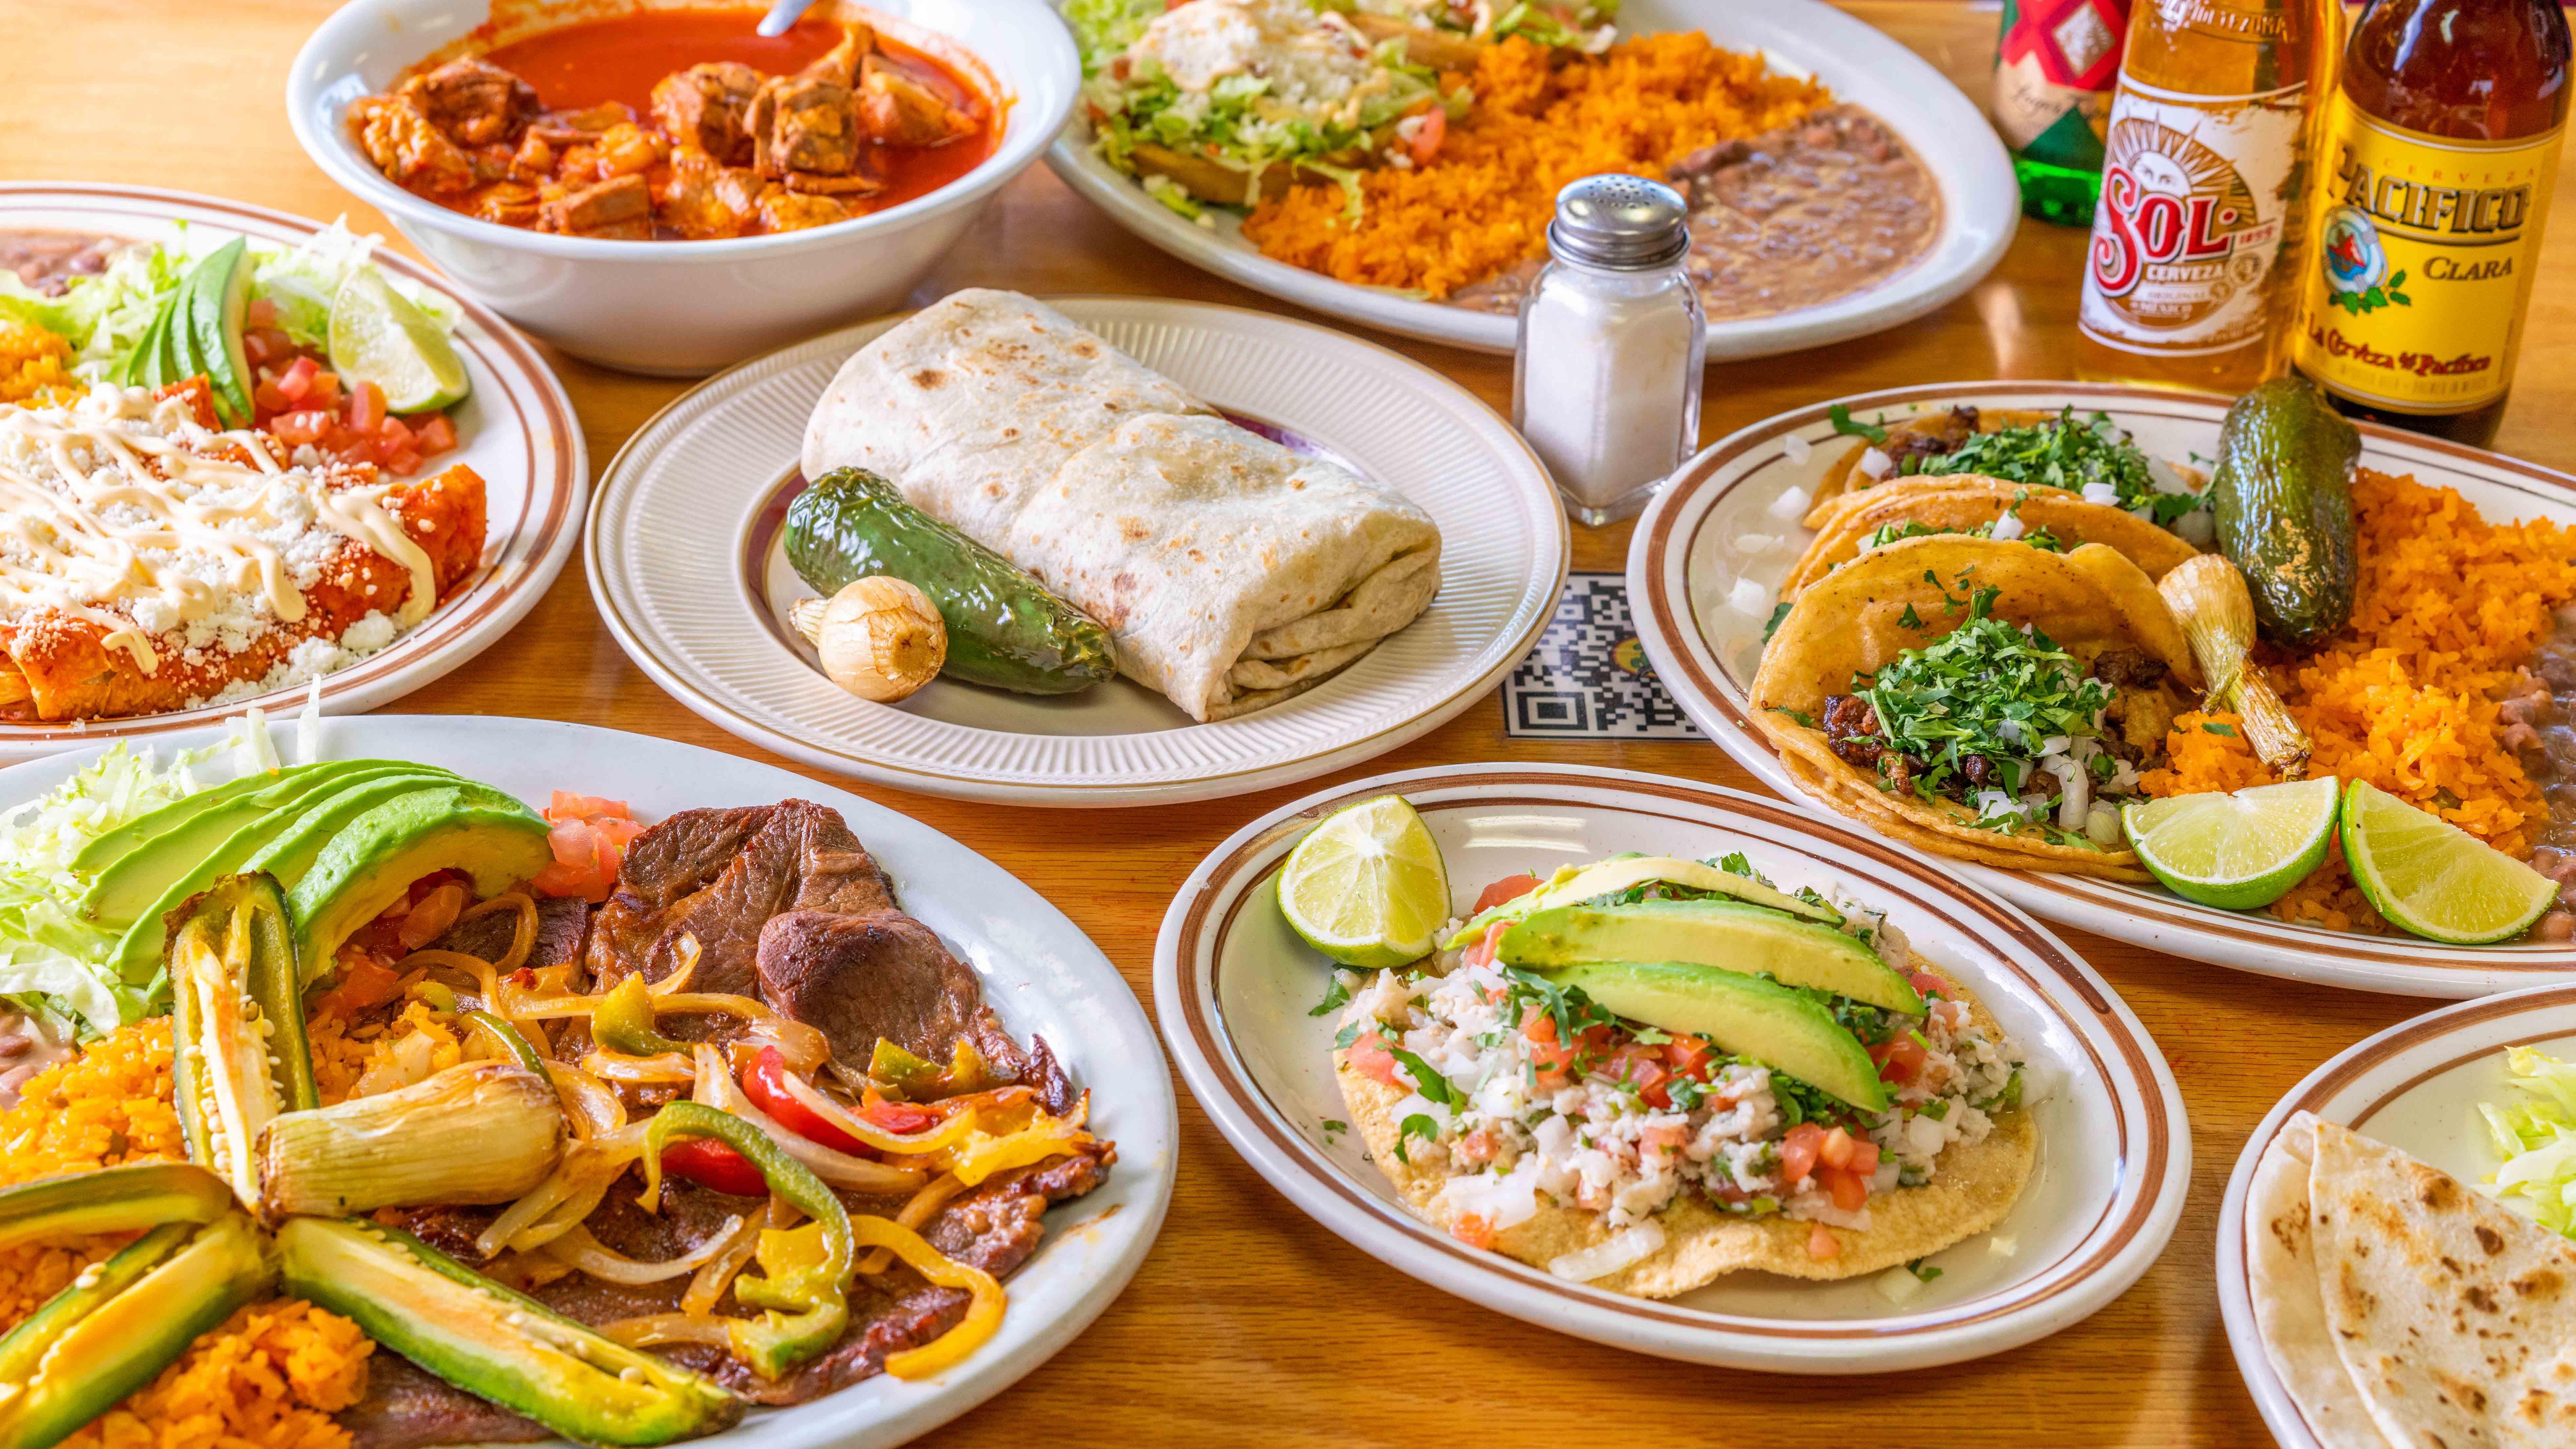 Fronteras Mexican Restaurant in Appleton - Highlight